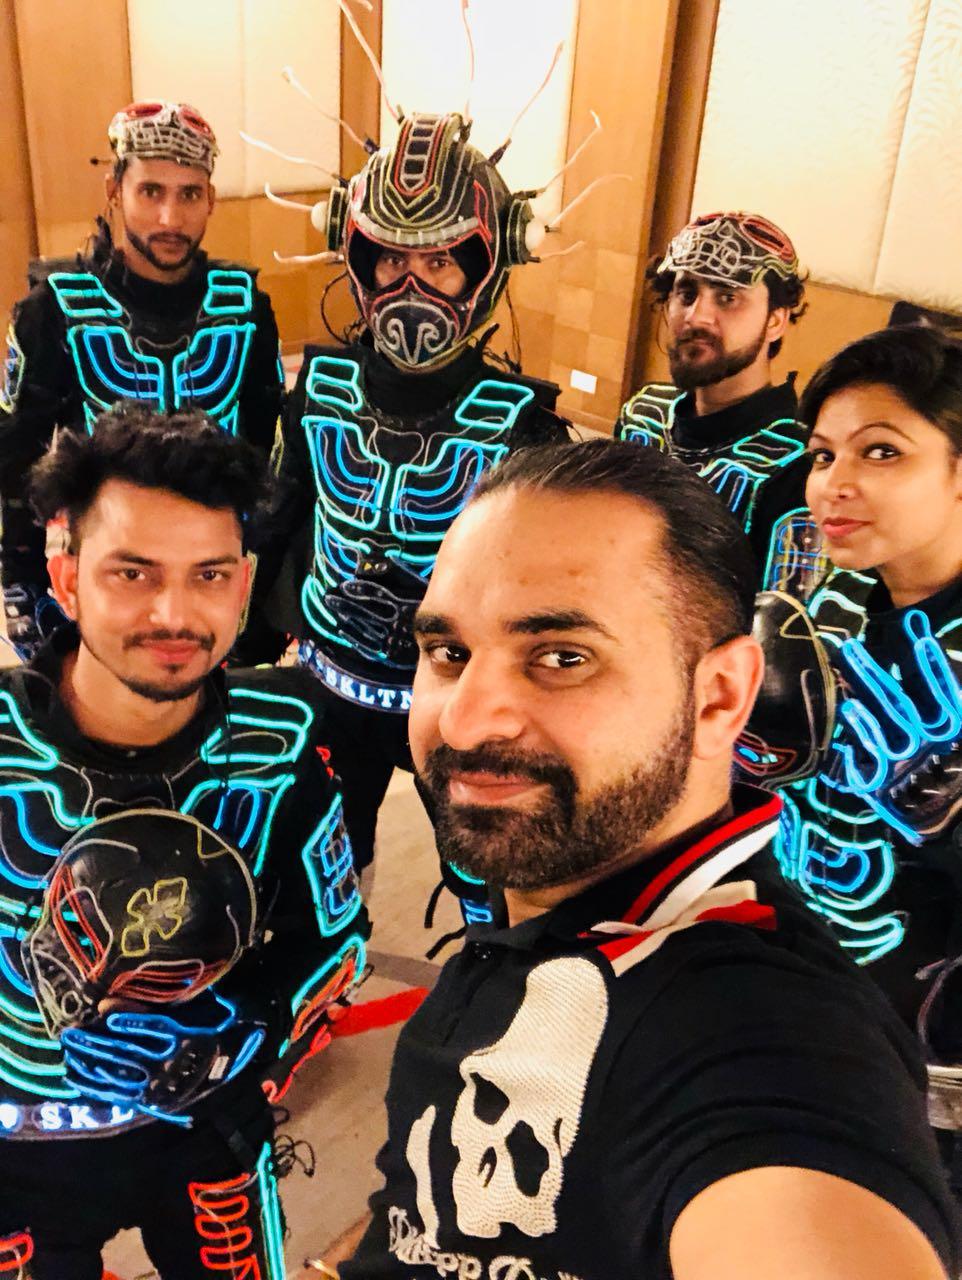 Tron Dance group